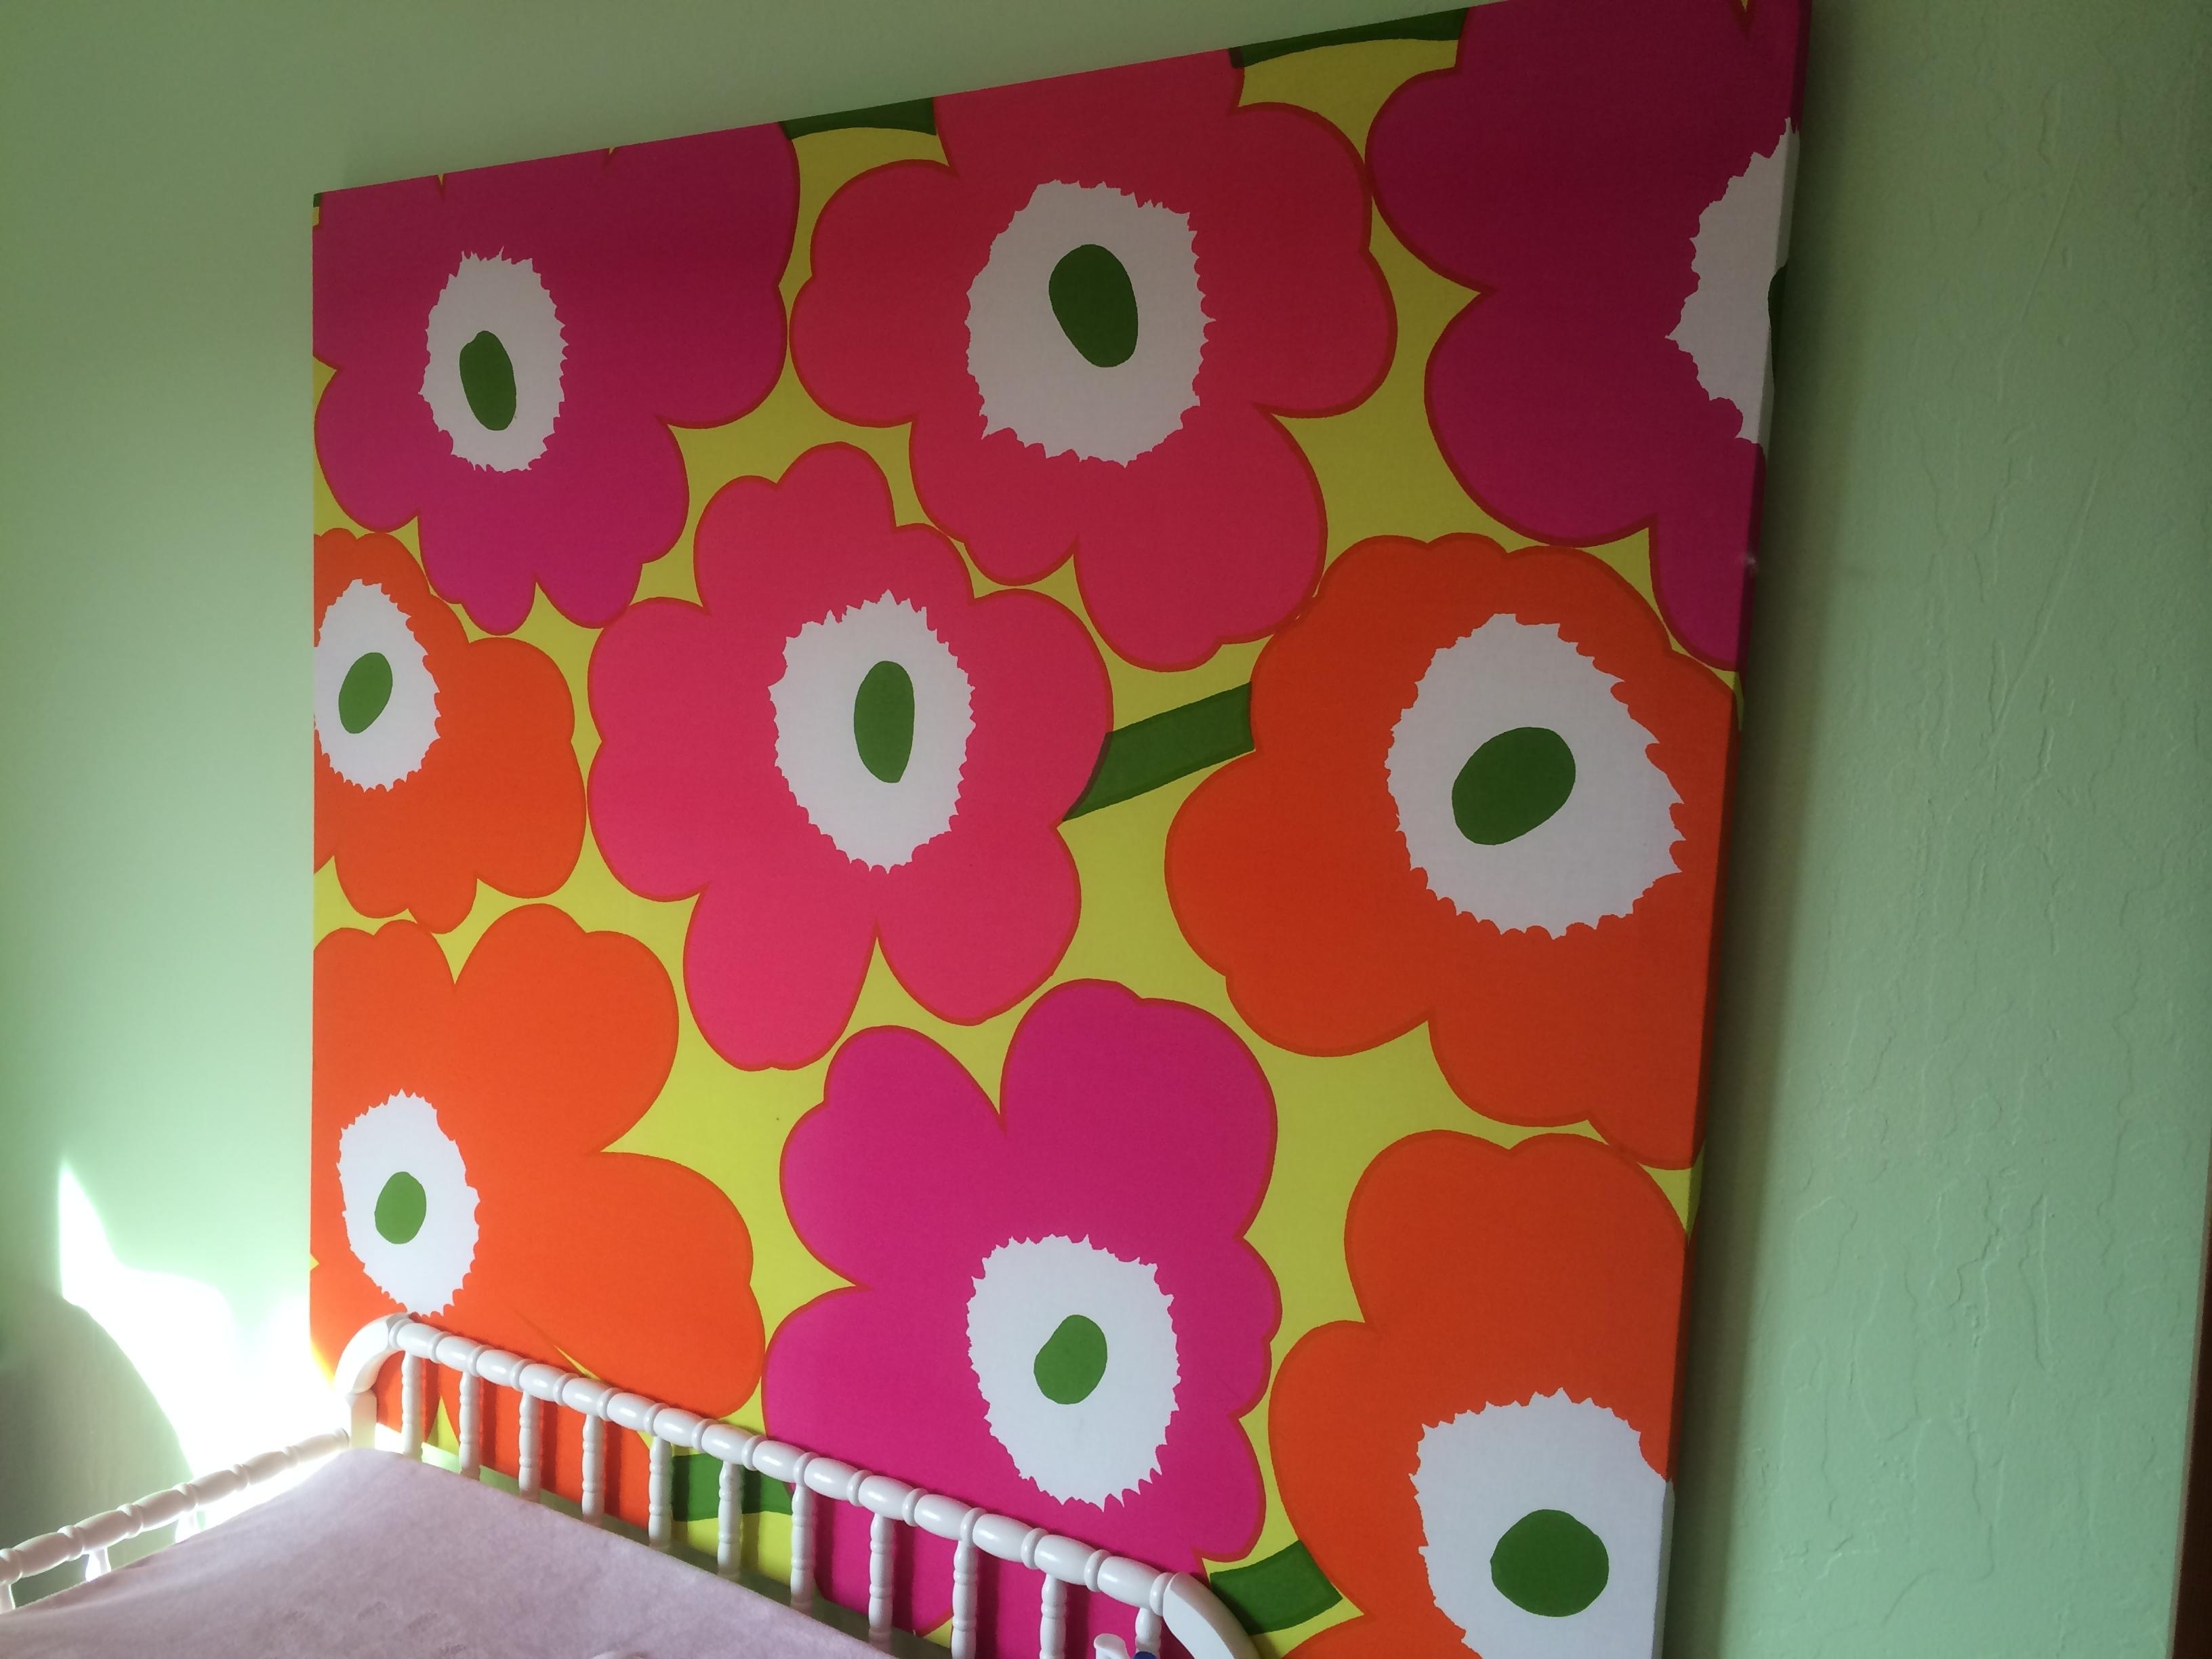 Today's Hint: Easy Diy Nursery & Playroom Wall Art – Hint Mama Within Most Popular Marimekko Fabric Wall Art (Gallery 9 of 15)